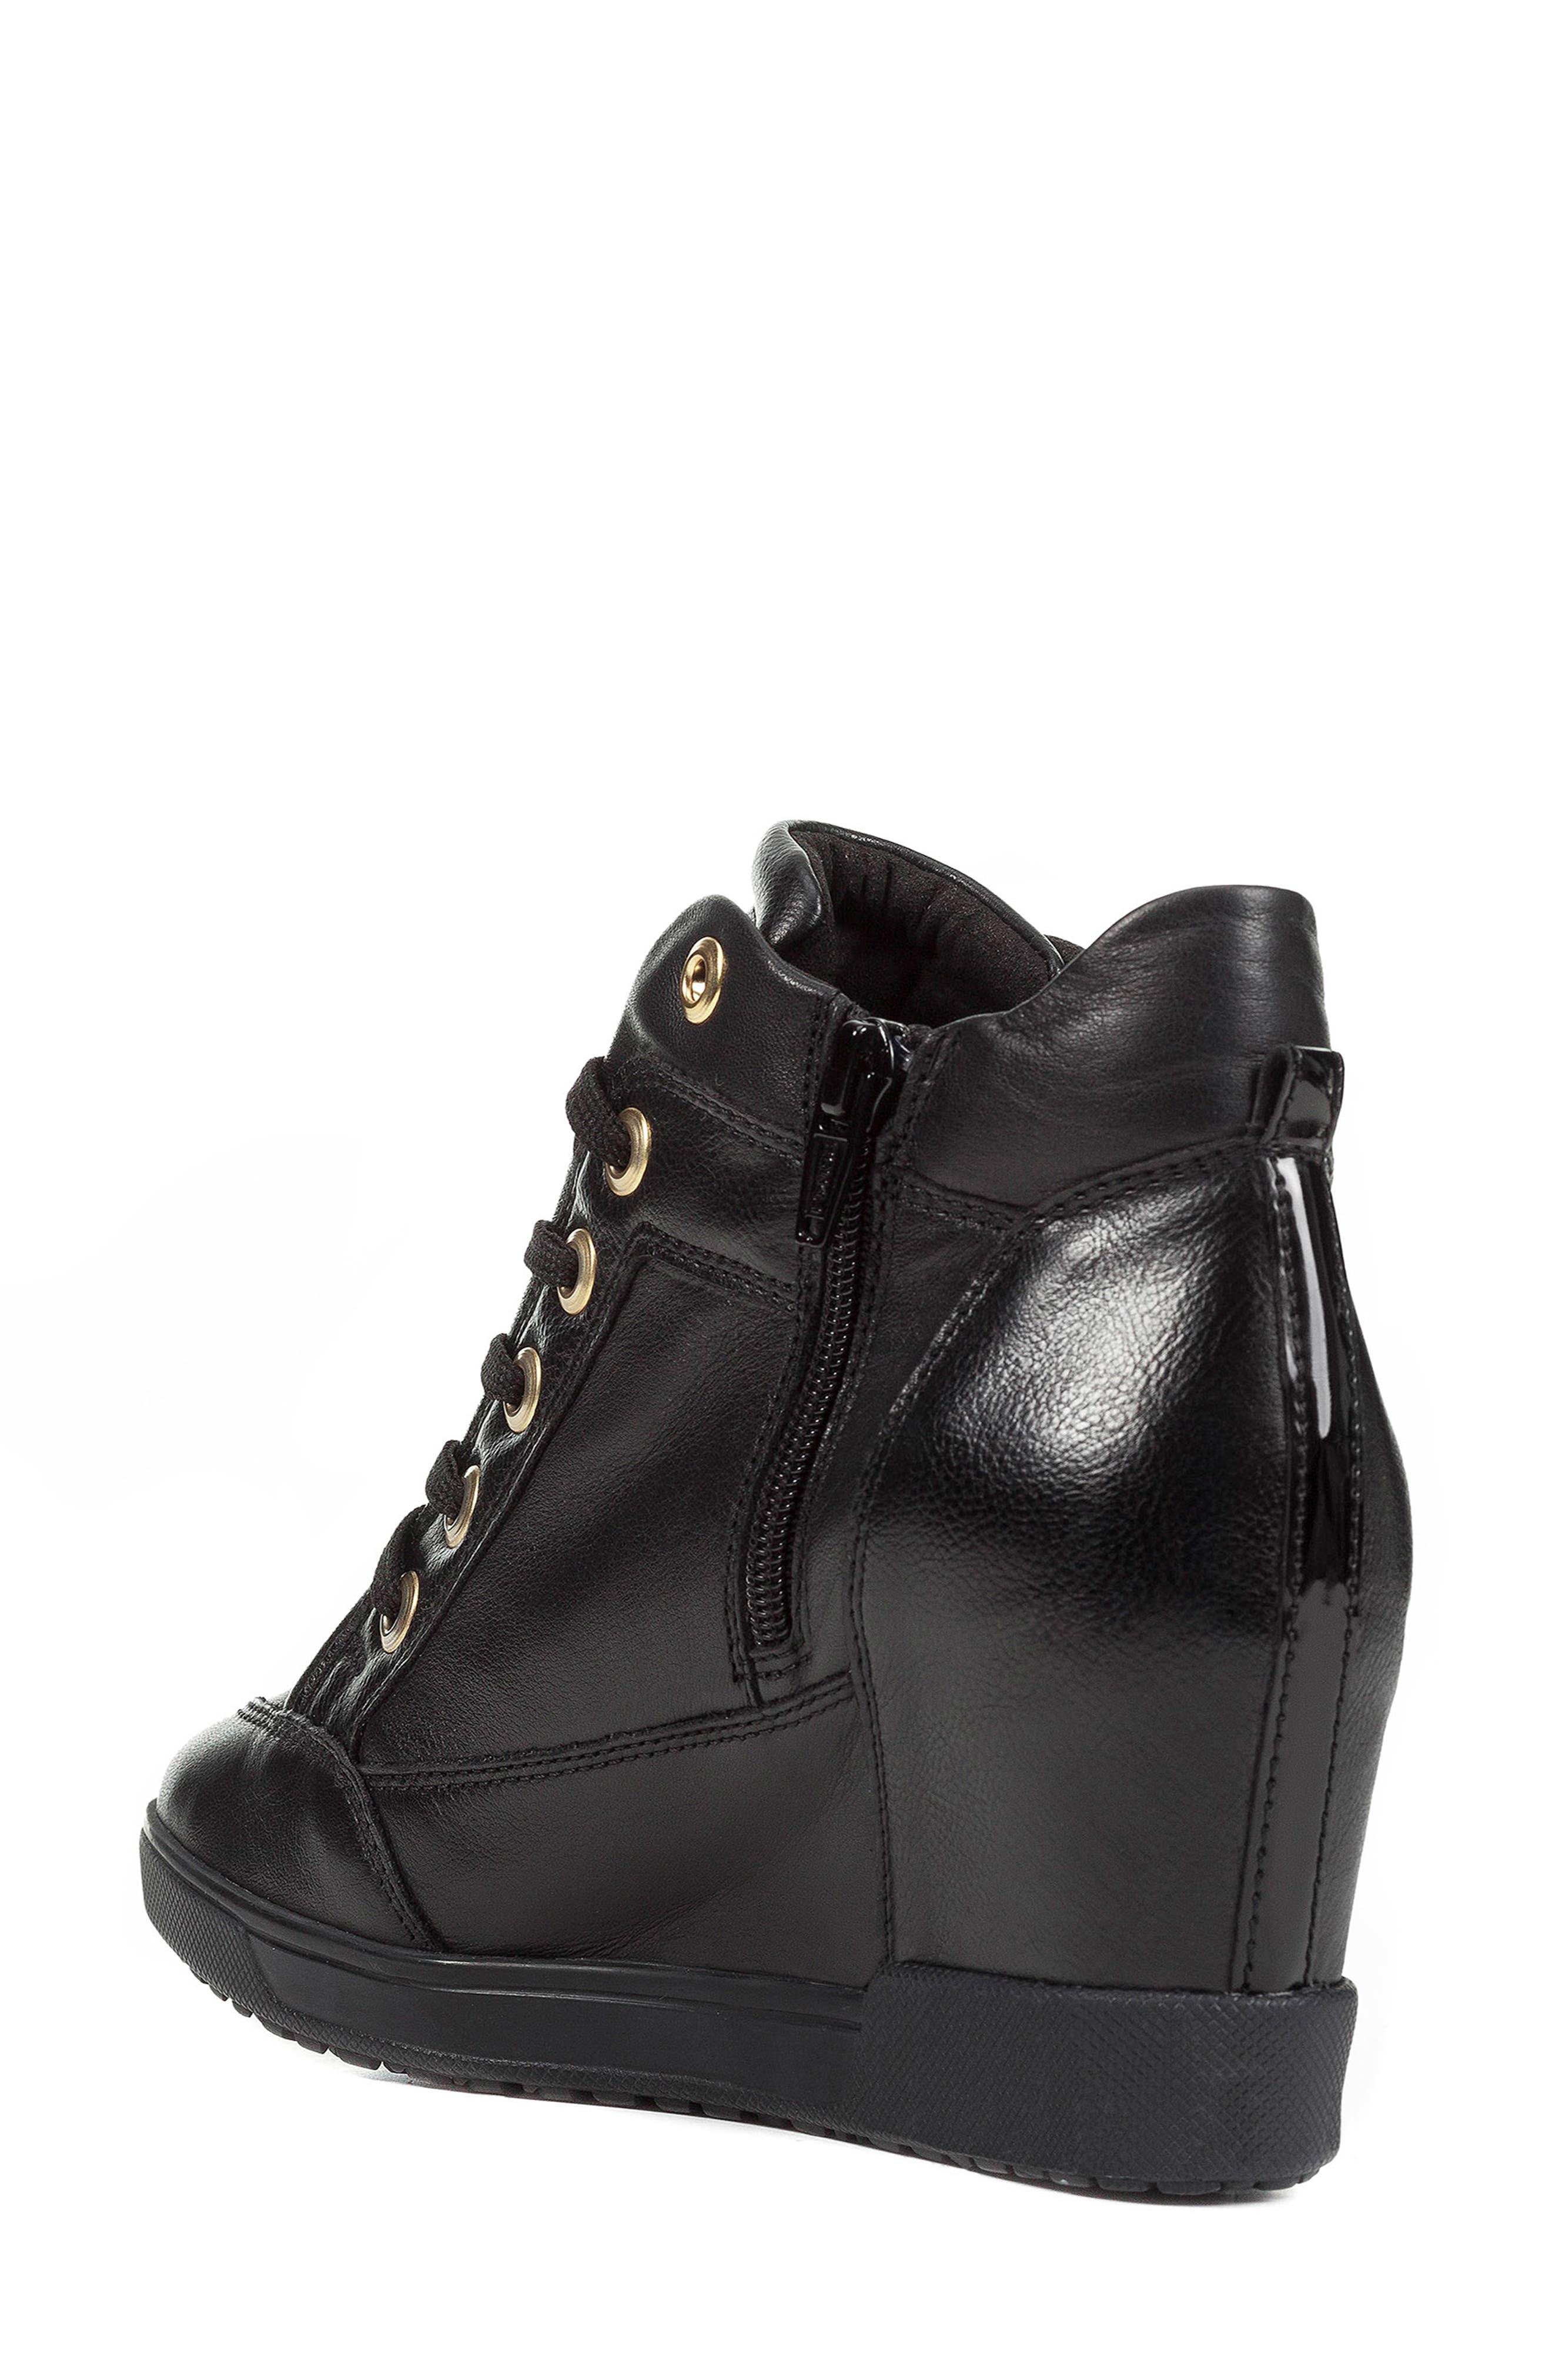 GEOX, Carum Wedge Sneaker, Alternate thumbnail 6, color, 001